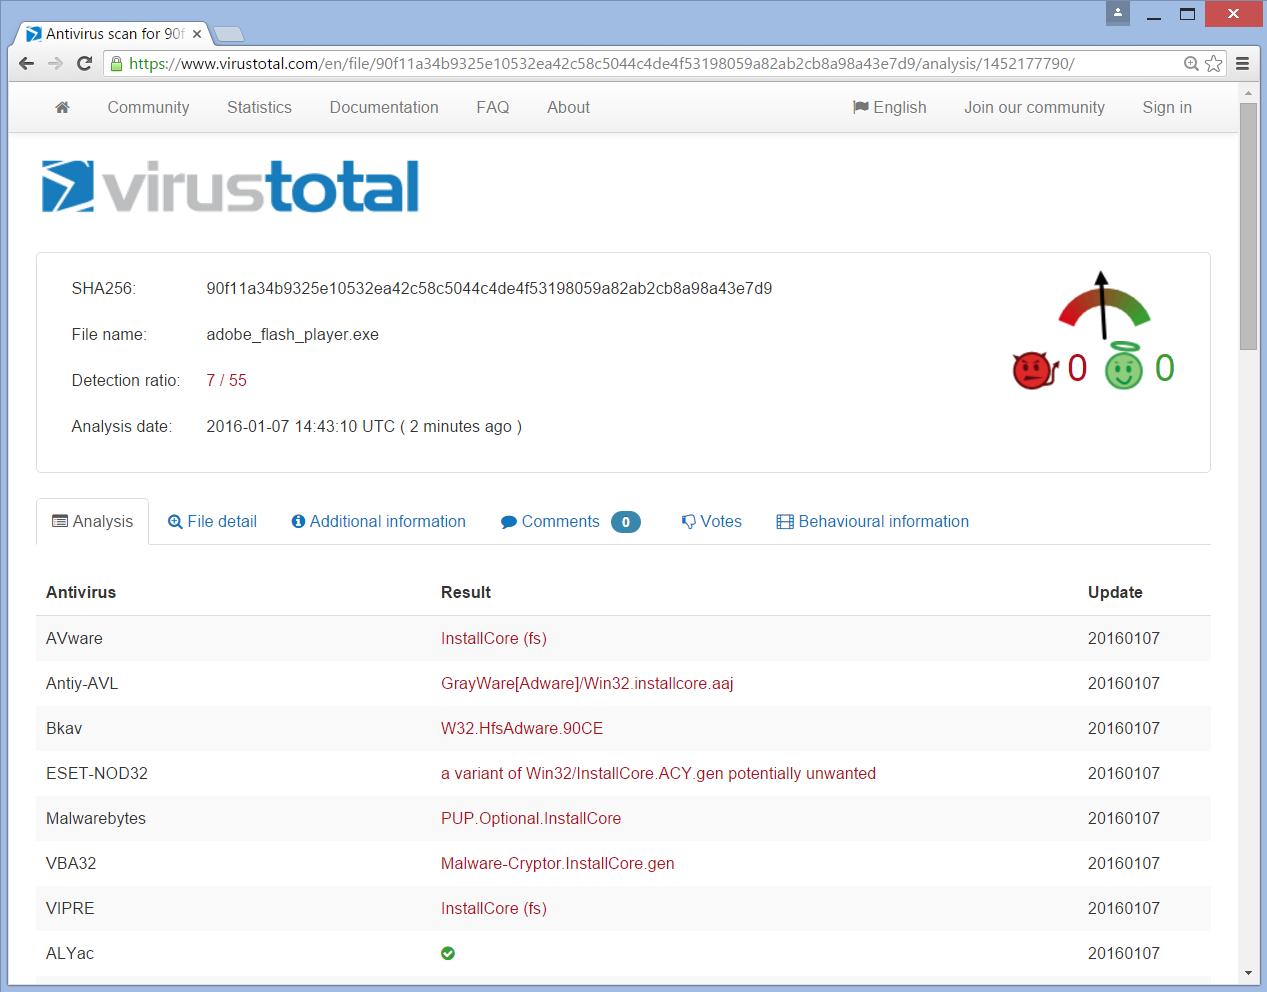 SensorsTechForum-travel-giga-adware-virustotal